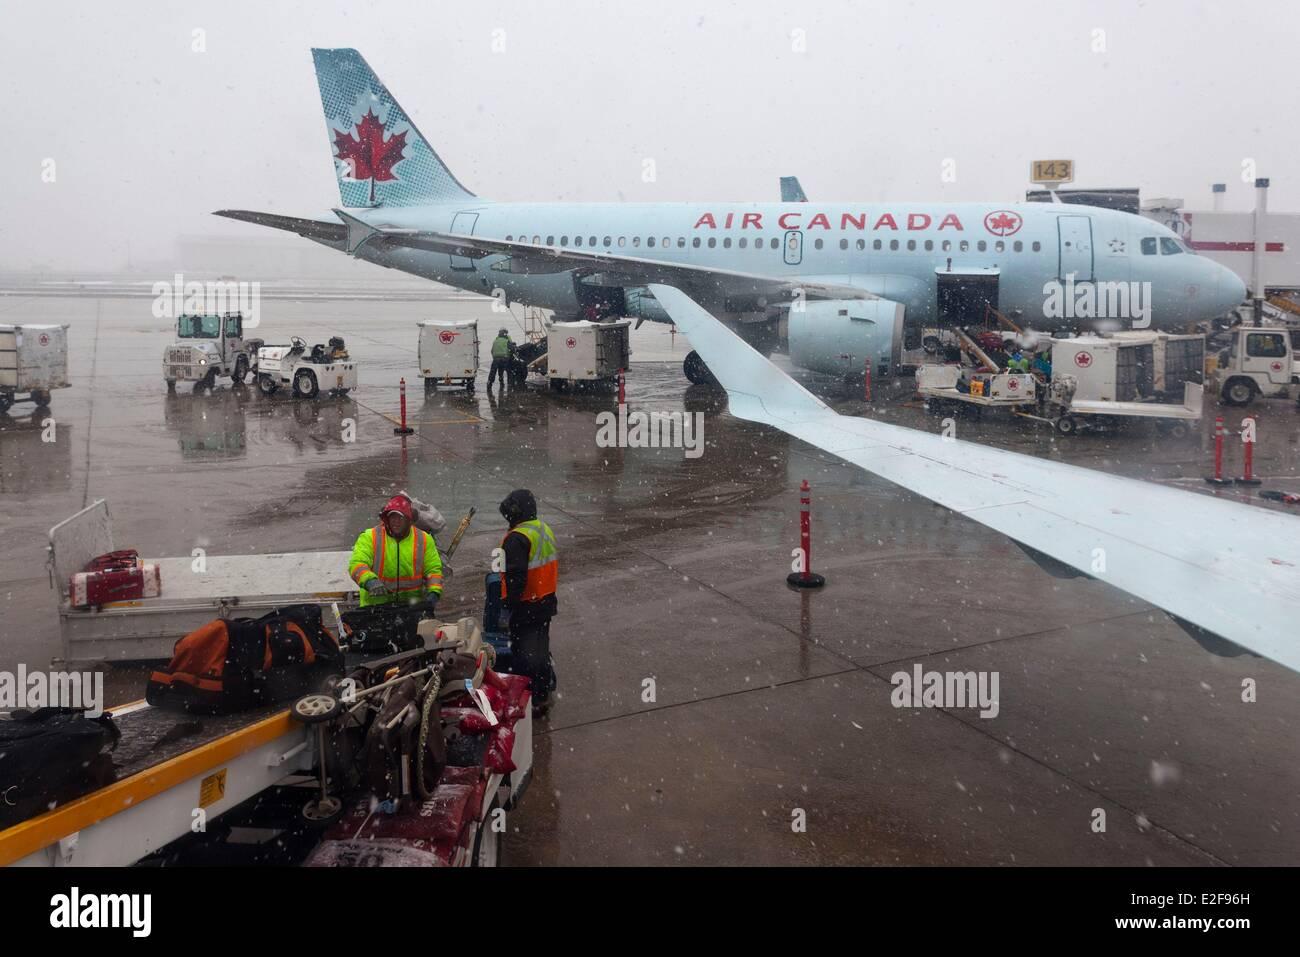 Saskatchewan, Saskatoon, Kanada, Flughafen, Gepäck beladen ein Flugzeug der Air Canada Stockbild